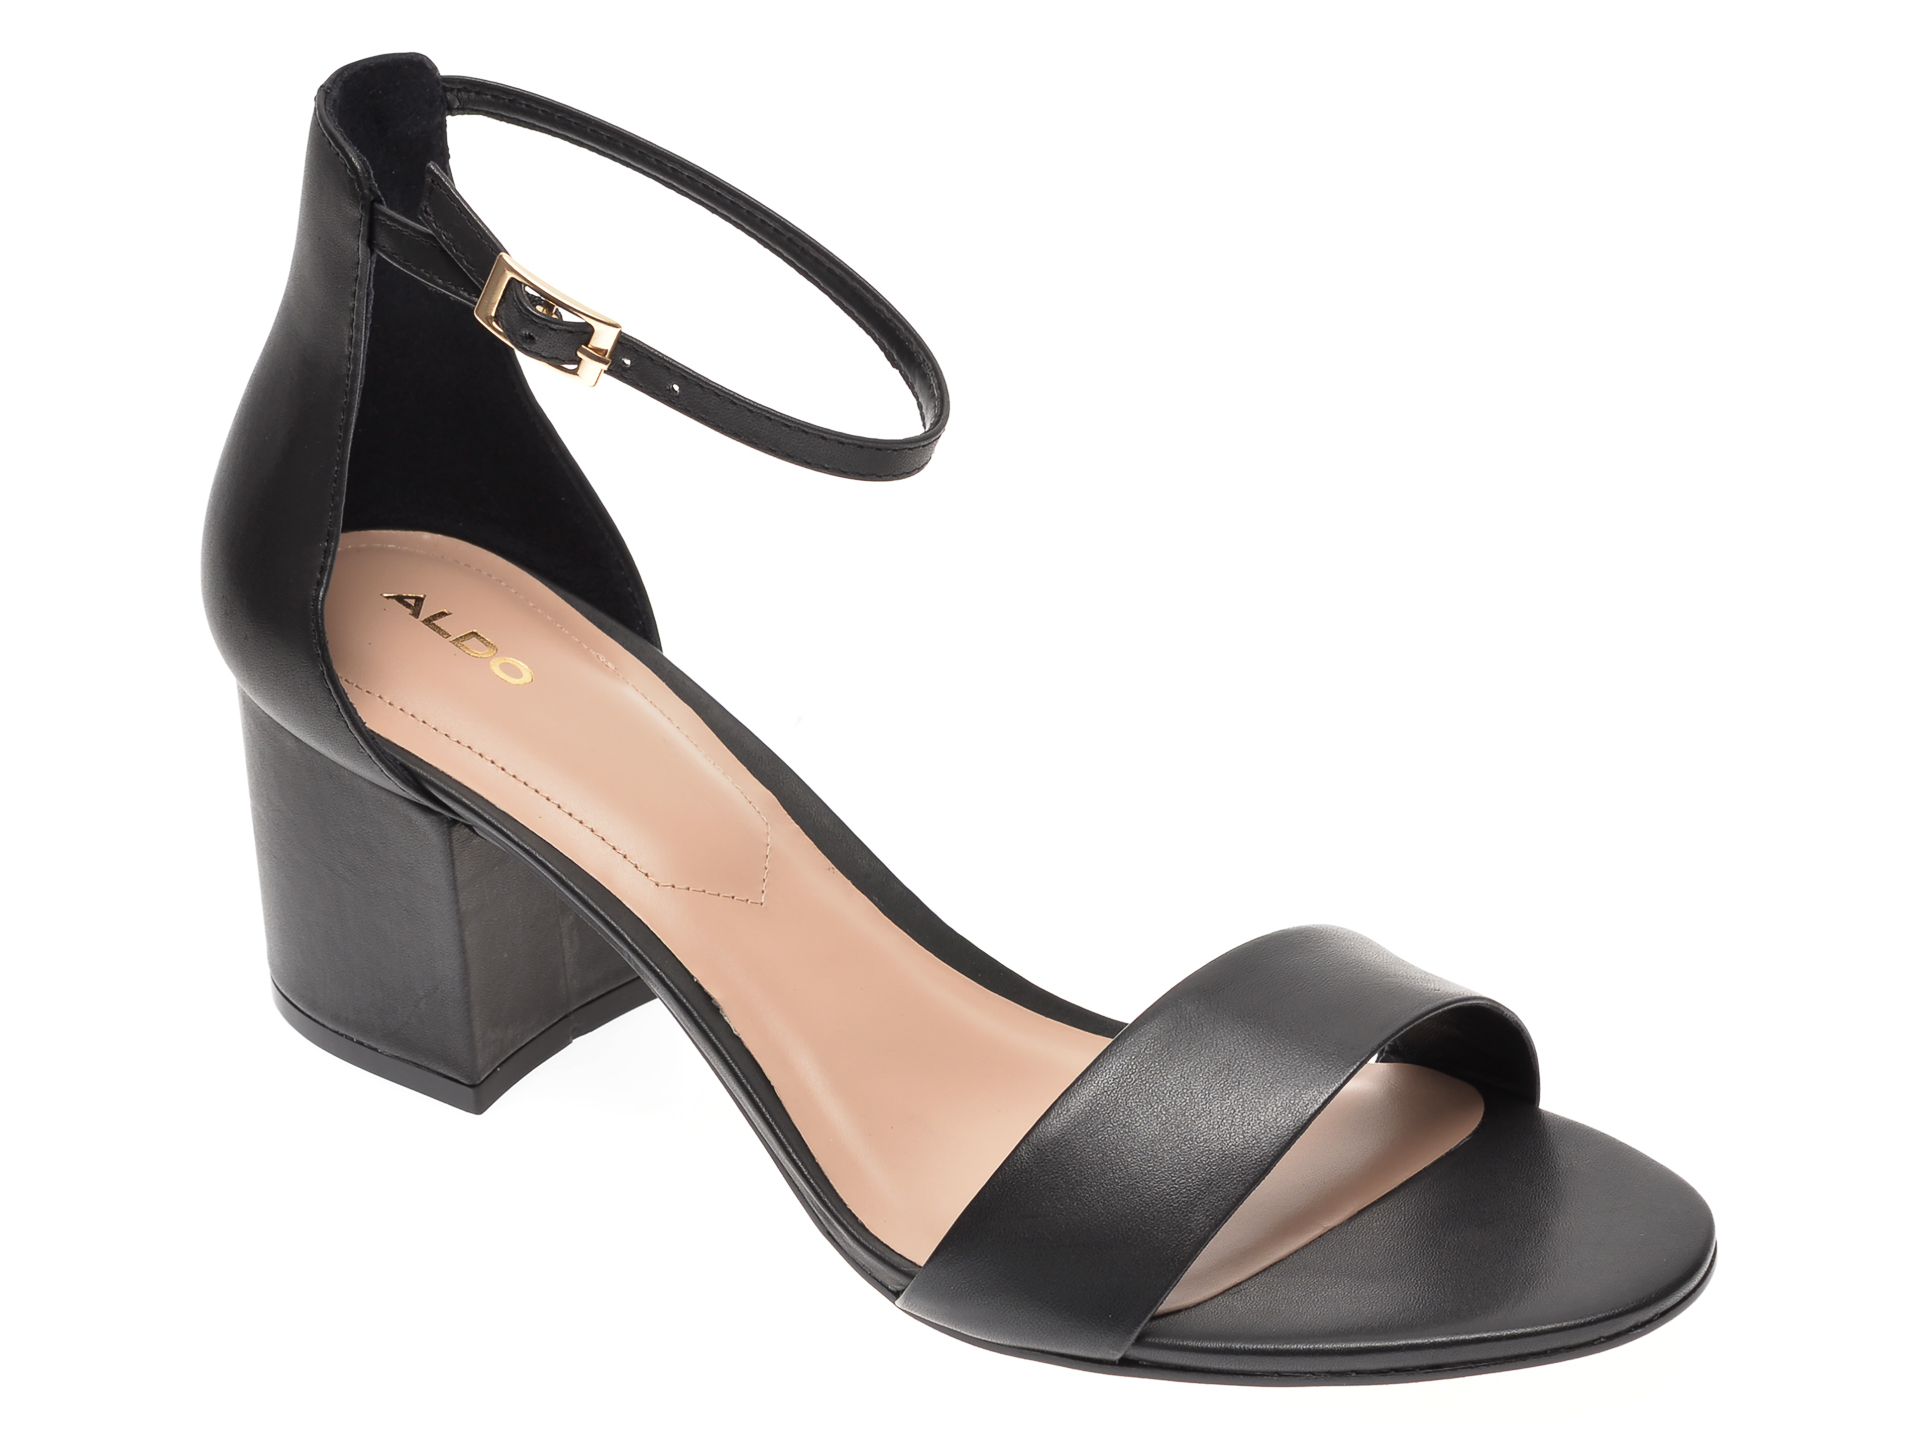 Sandale ALDO negre, Villarosa009, din piele naturala imagine otter.ro